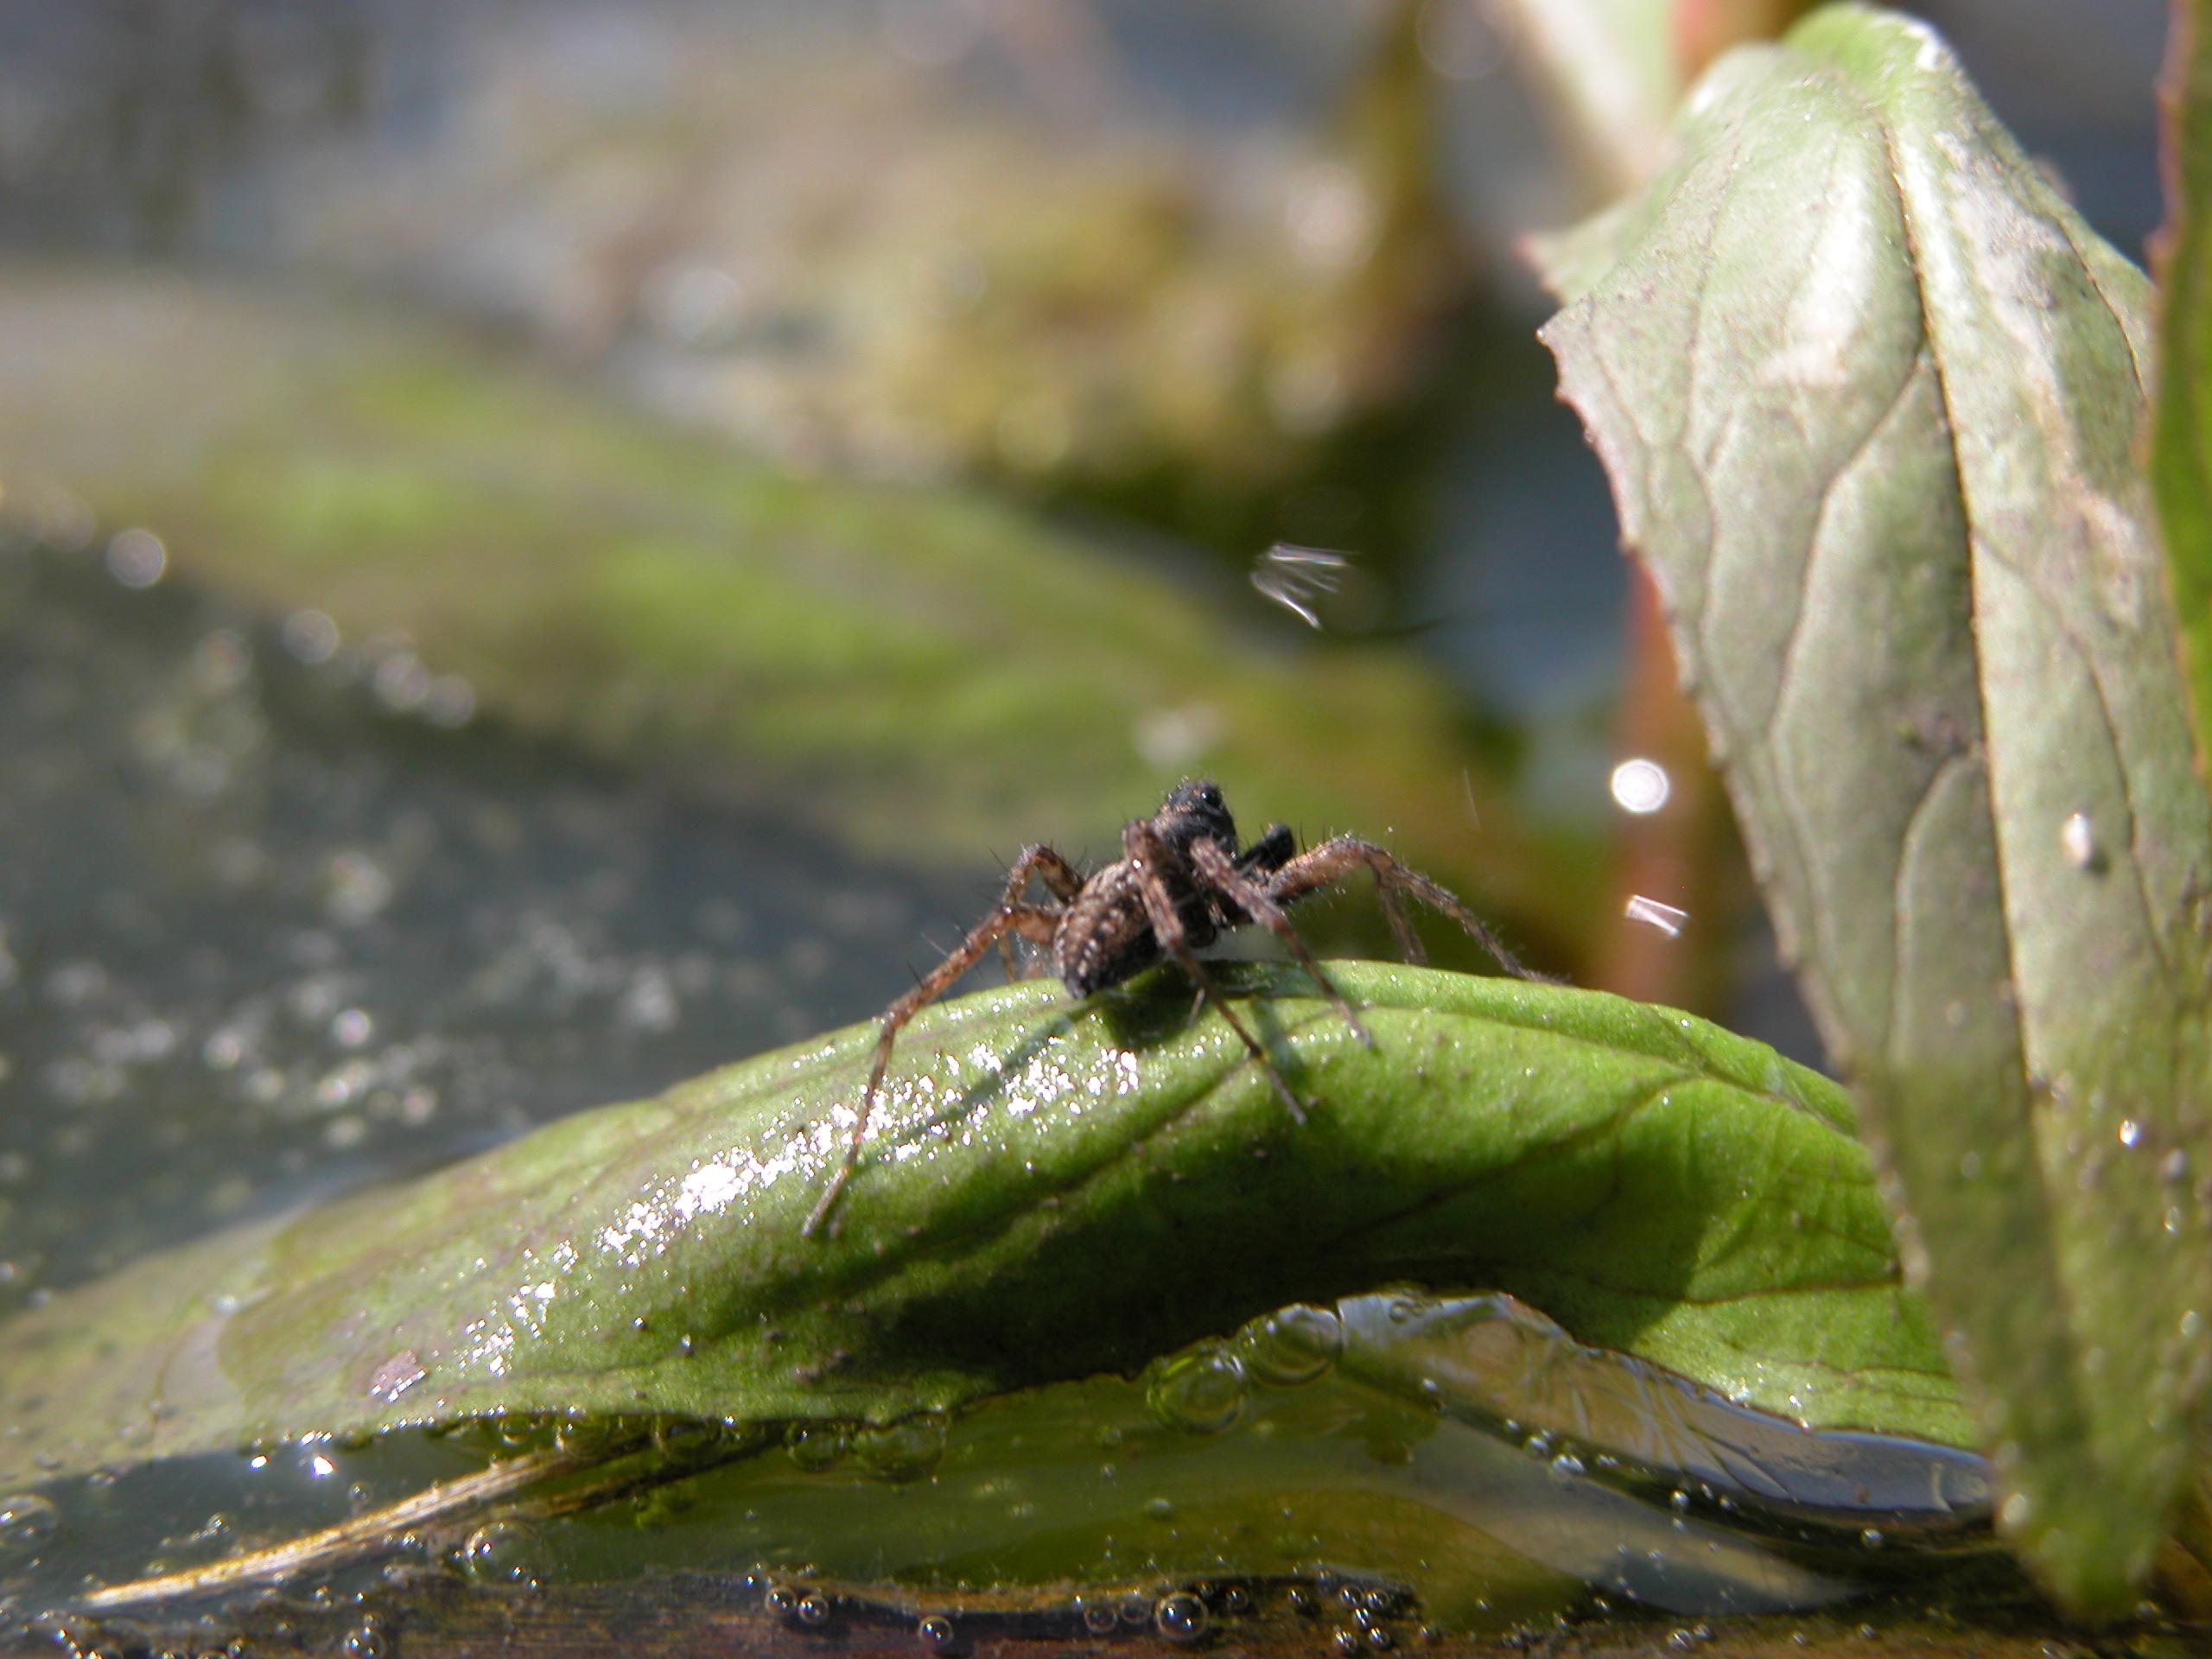 spider arachnid water leaf hanging on legs